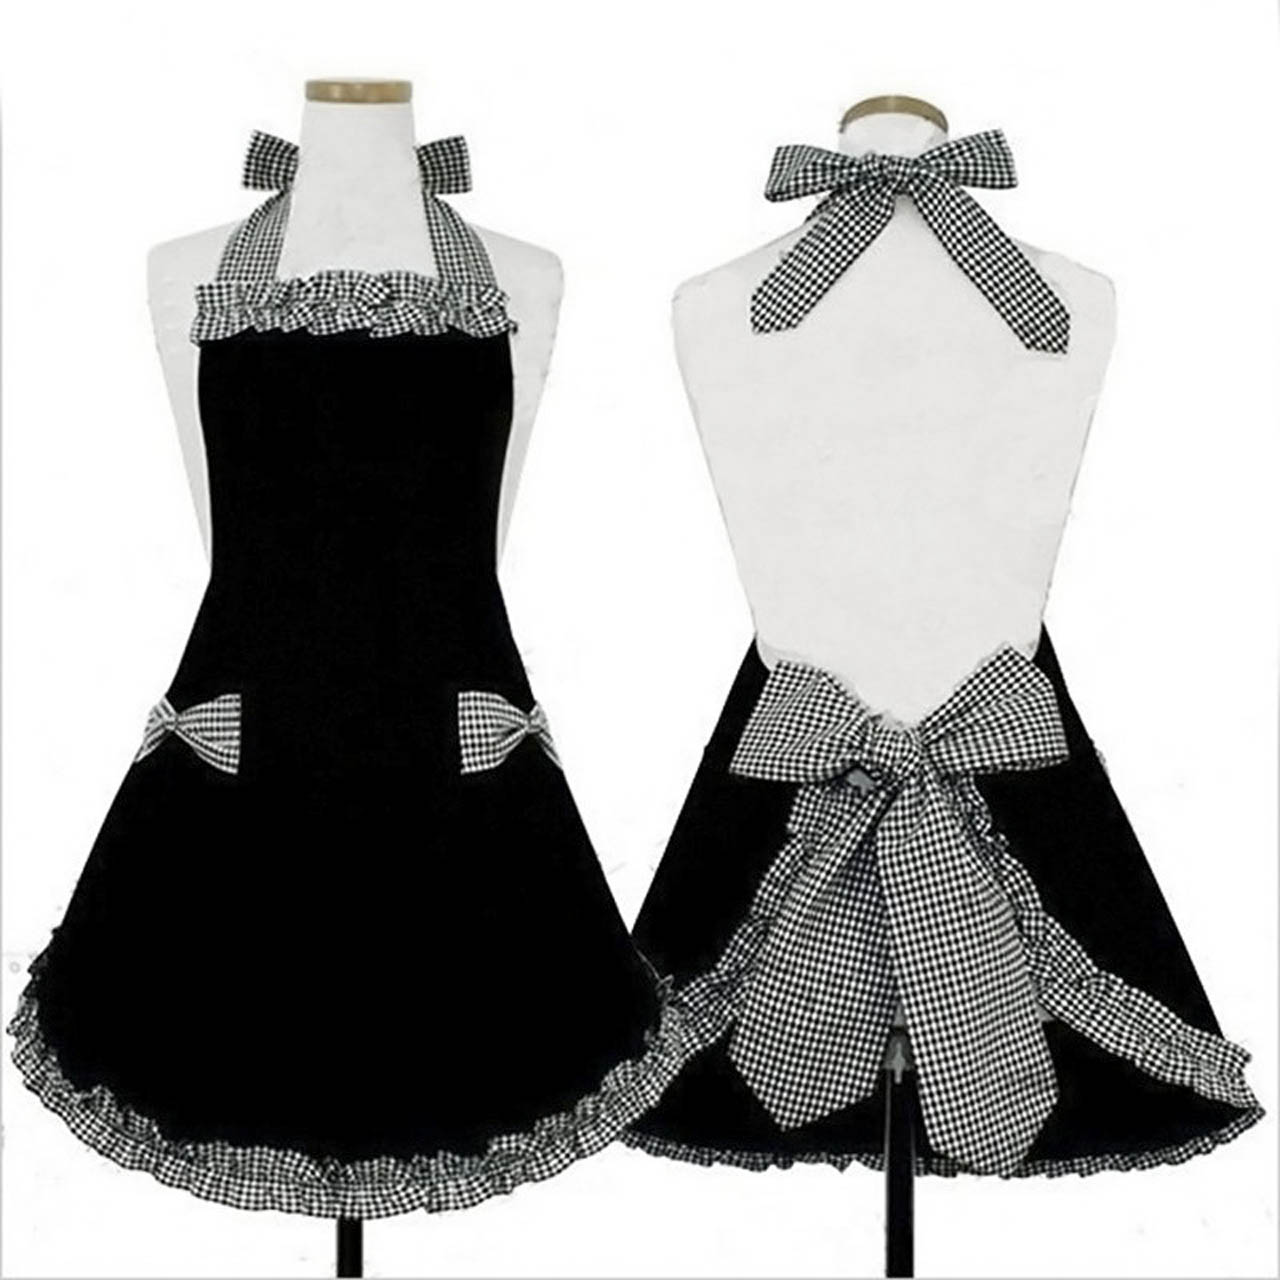 Fashion Vintage Style Bowknots Pockets Design Kitchen Cooking Grid Pattern Princess Cotton Apron